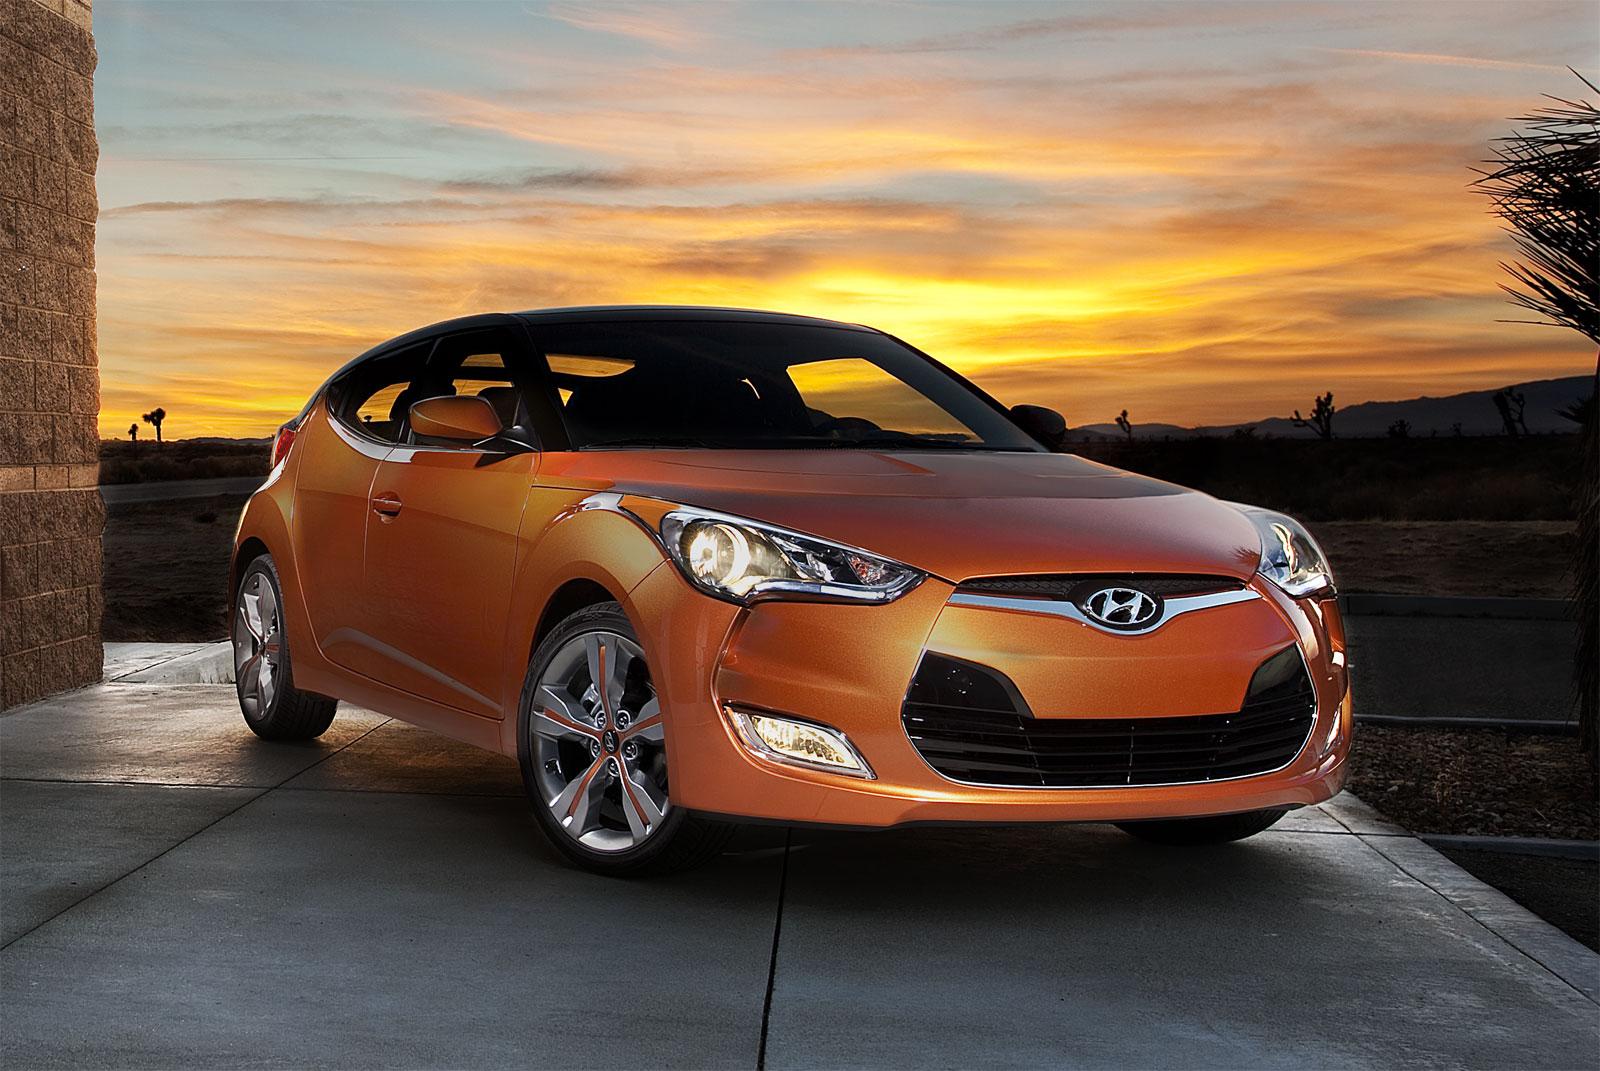 http://1.bp.blogspot.com/-OZ8erlXptDo/T-Fdl2uoFaI/AAAAAAAADqA/5StxJsAbN5g/s1600/Hyundai+Veloster+hd+Wallpapers+2012_1.jpg